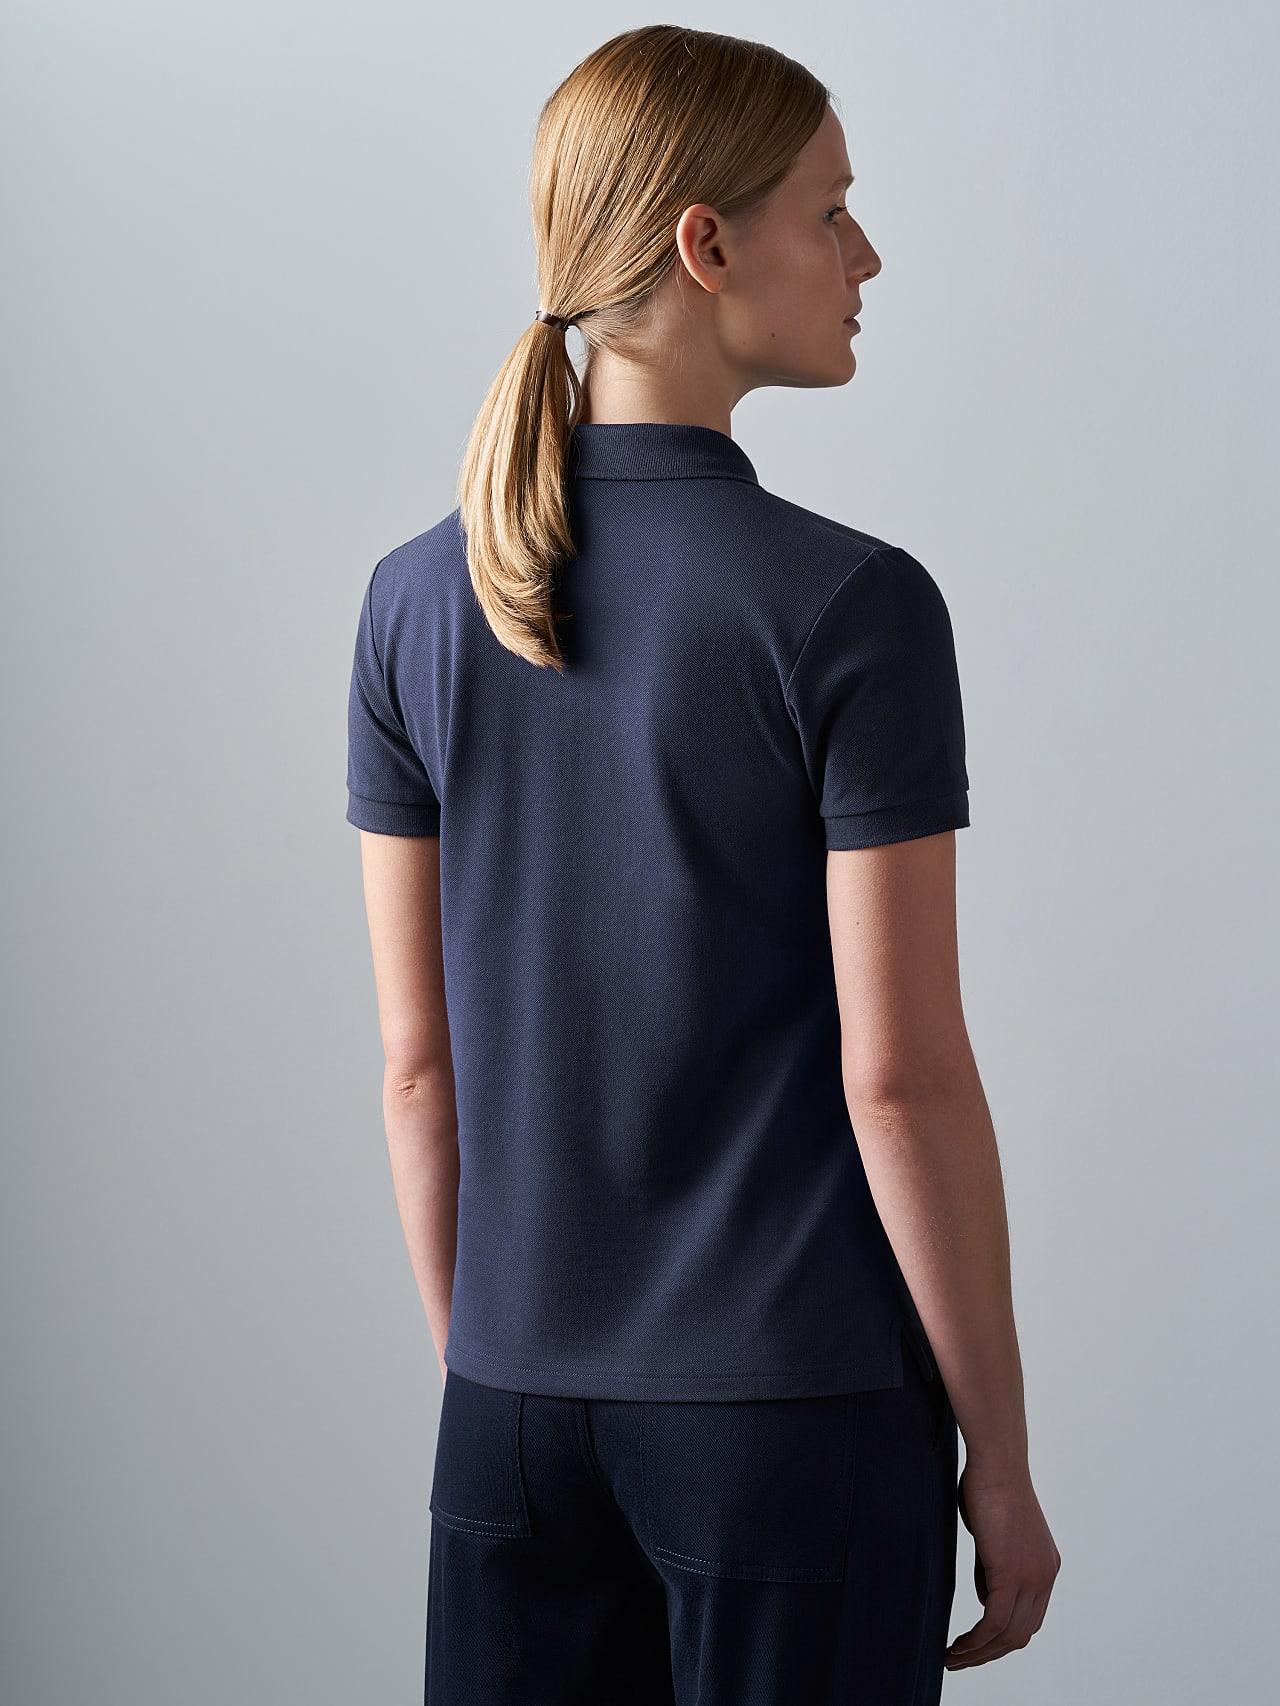 JANEY V1.Y5.02 Piqué-Poloshirt Navy Rechts Alpha Tauri